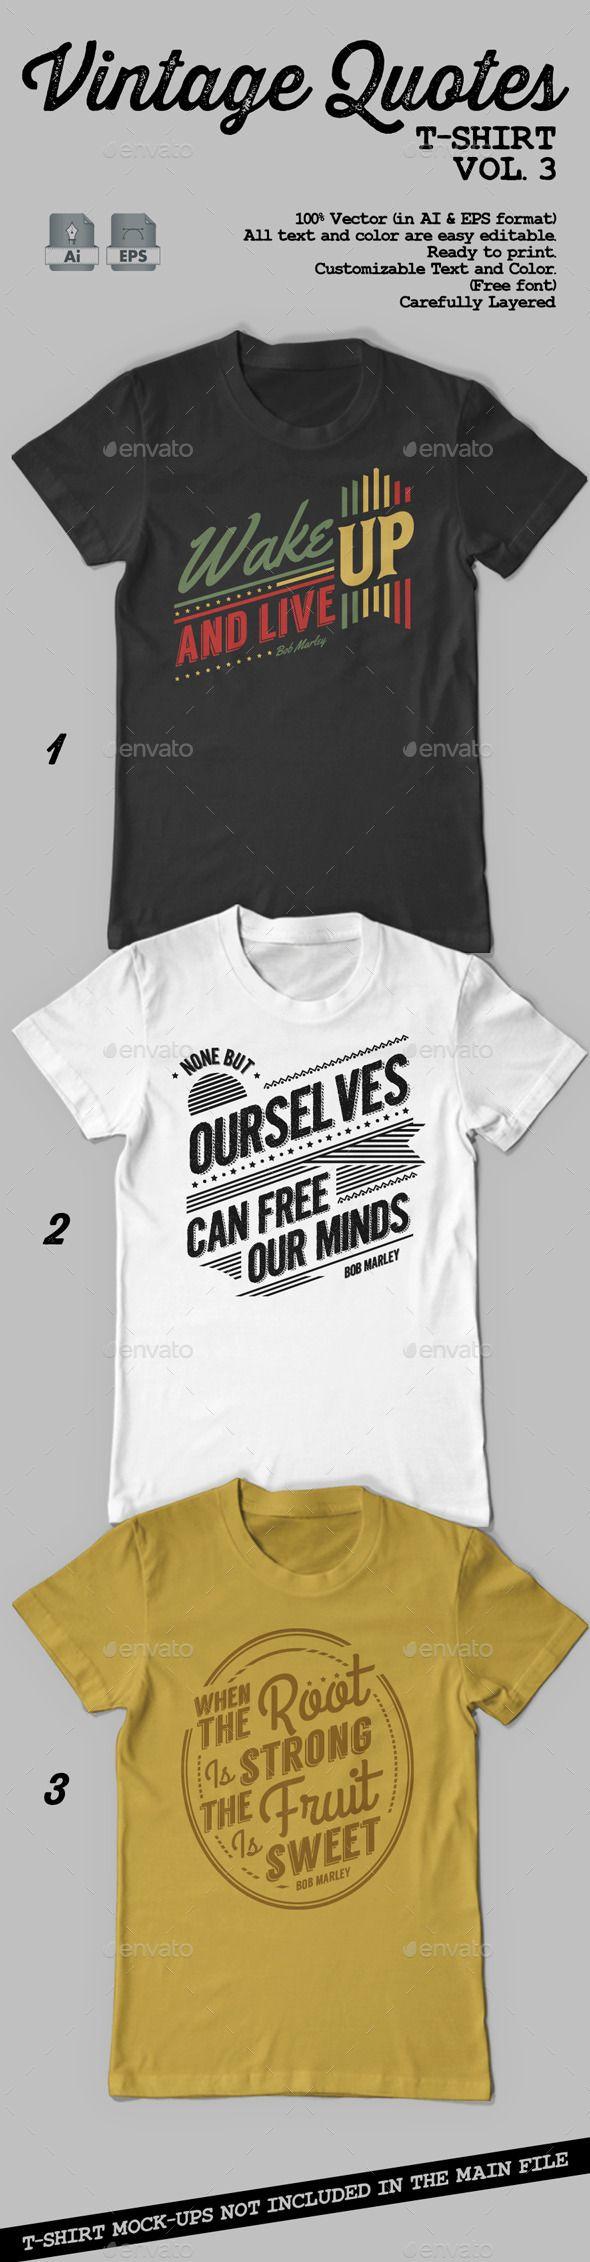 Vintage Quotes T-Shirt Vol. 3